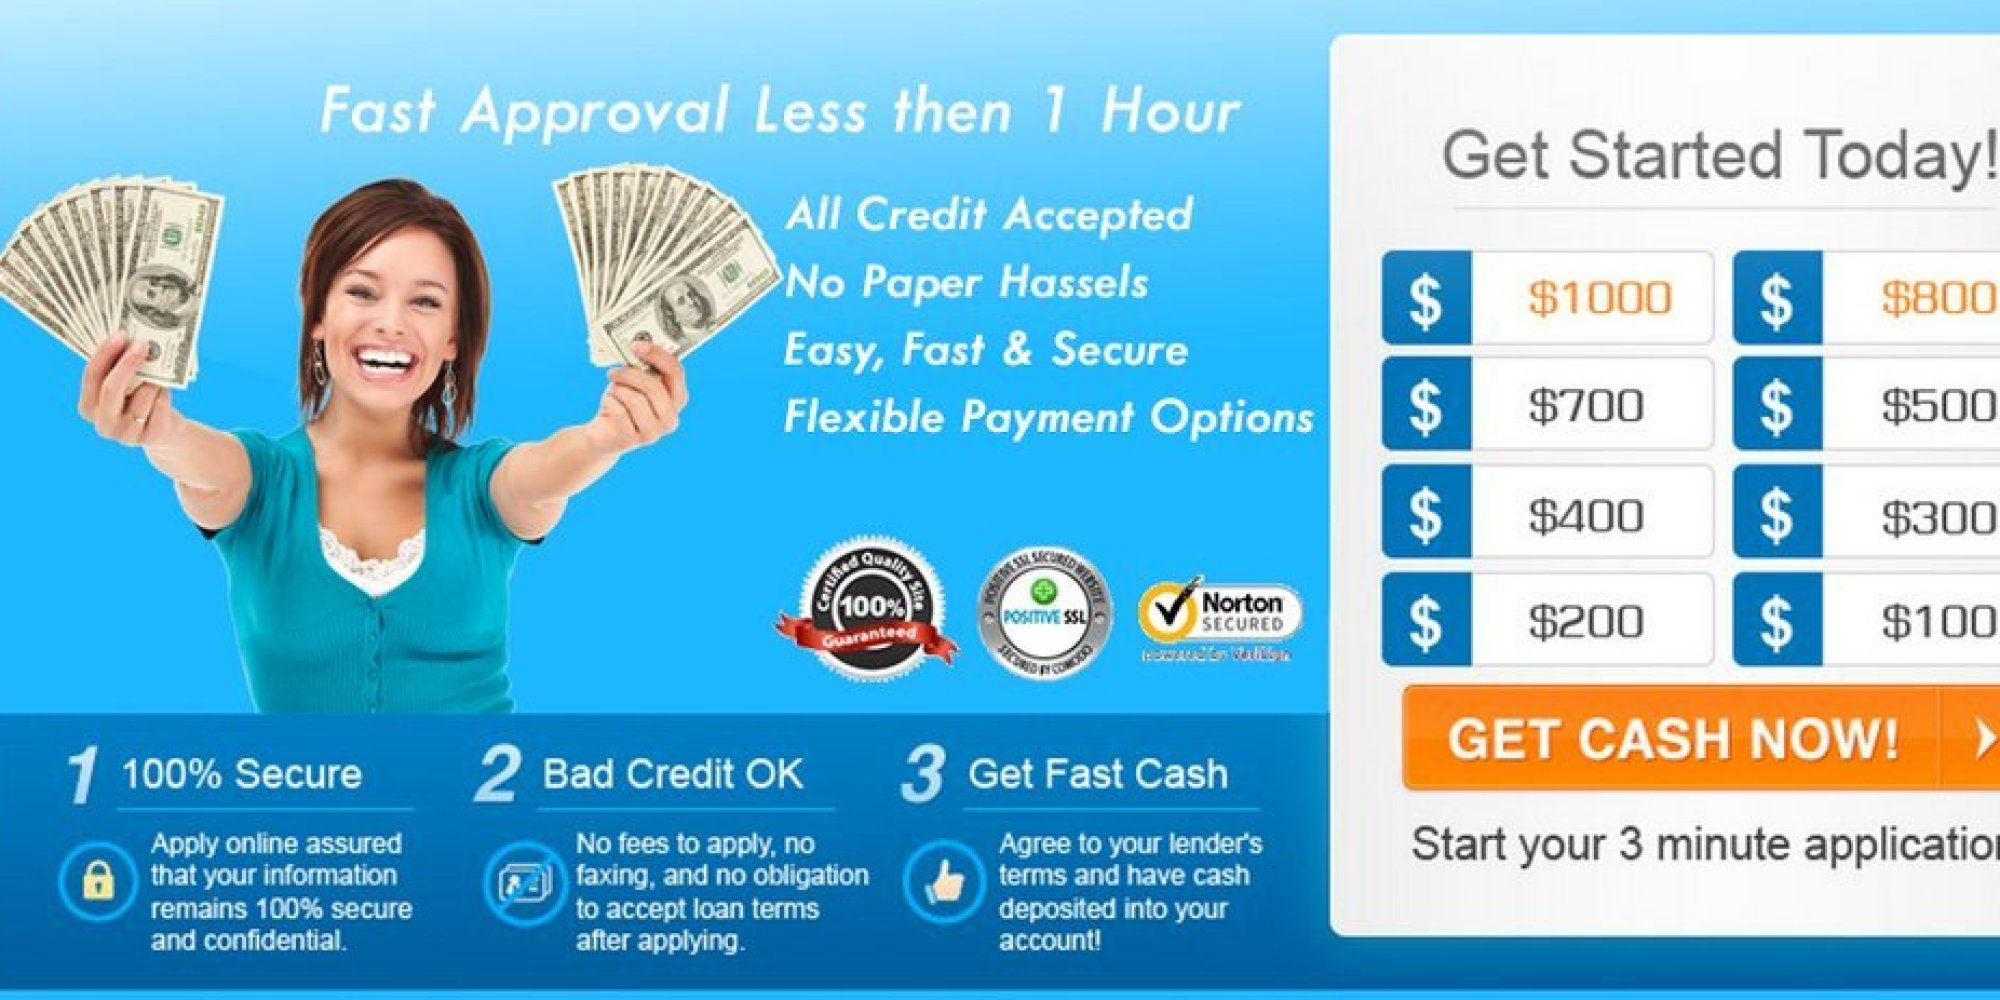 payday loans in woodstock va - 3